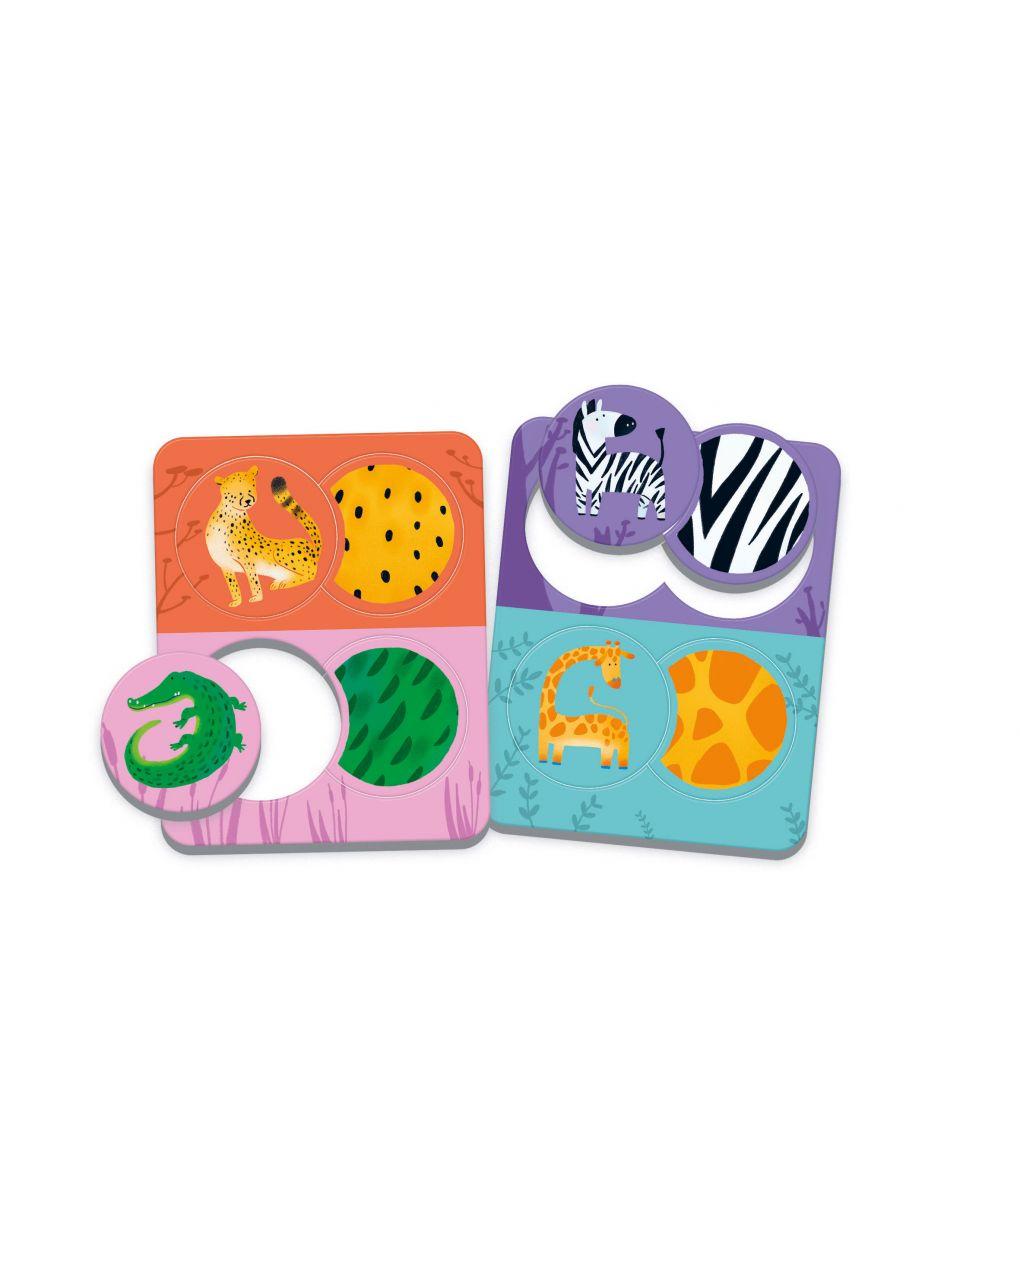 Clementoni - little match animali & texture - Clementoni